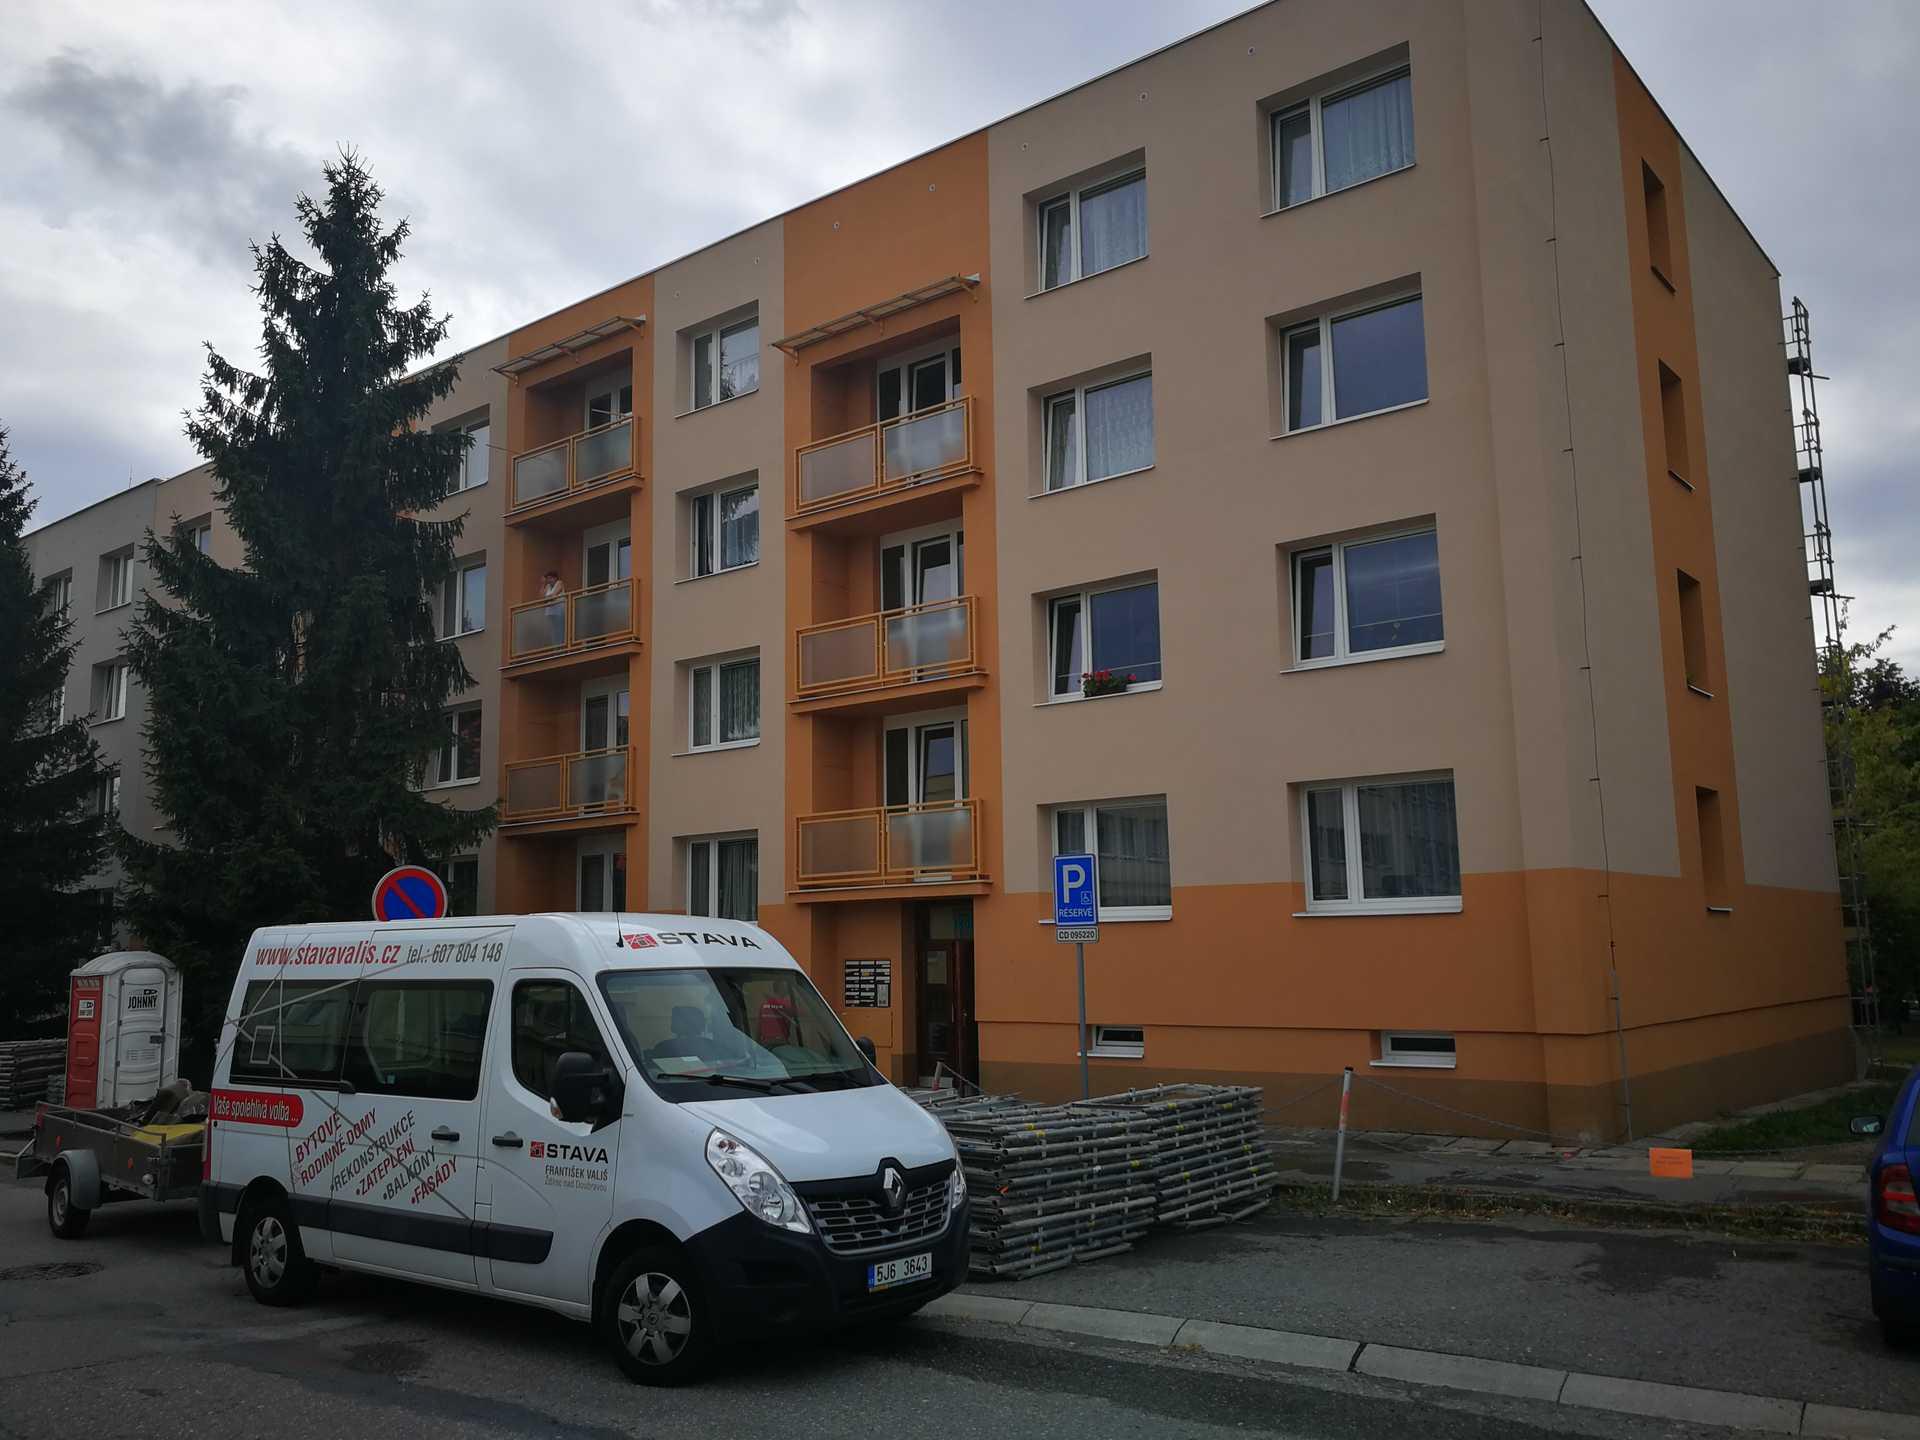 STAVA - František Vališ s.r.o. | Sanace